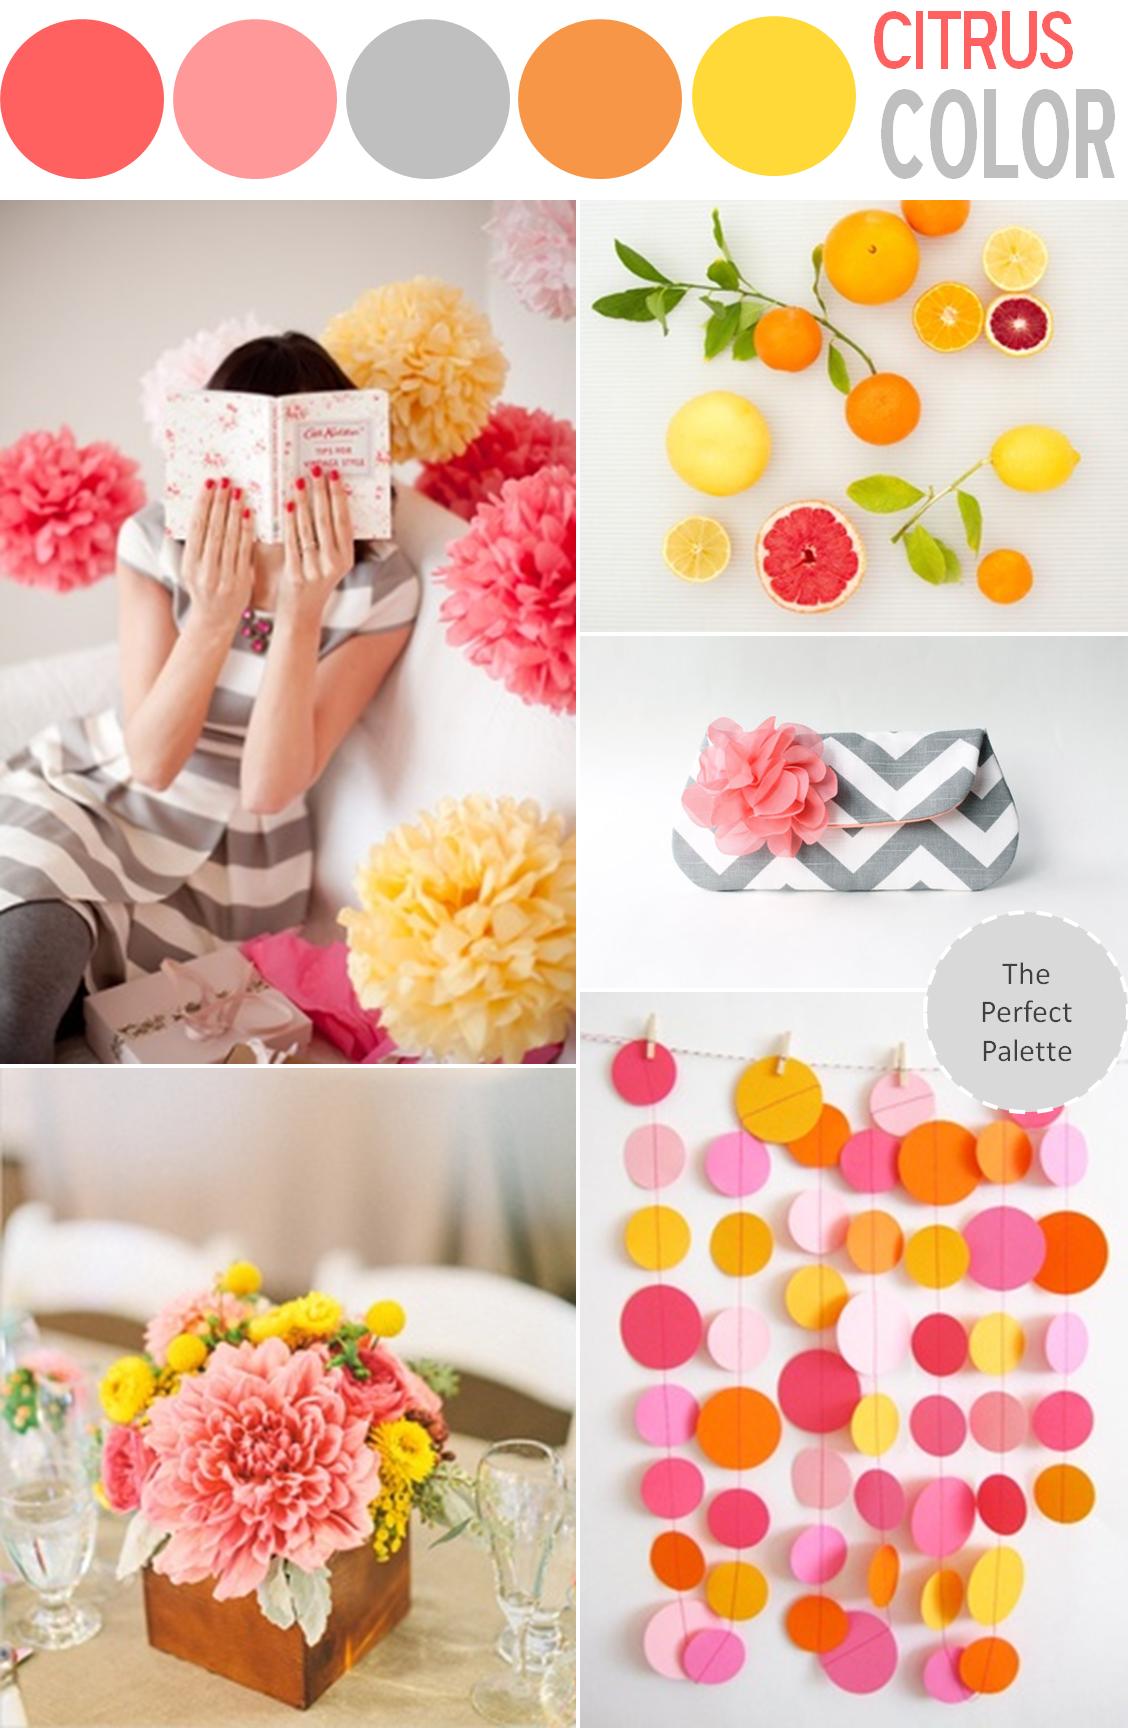 Wedding color schemes for june - The Perfect Palette June 2013 Wedding Color